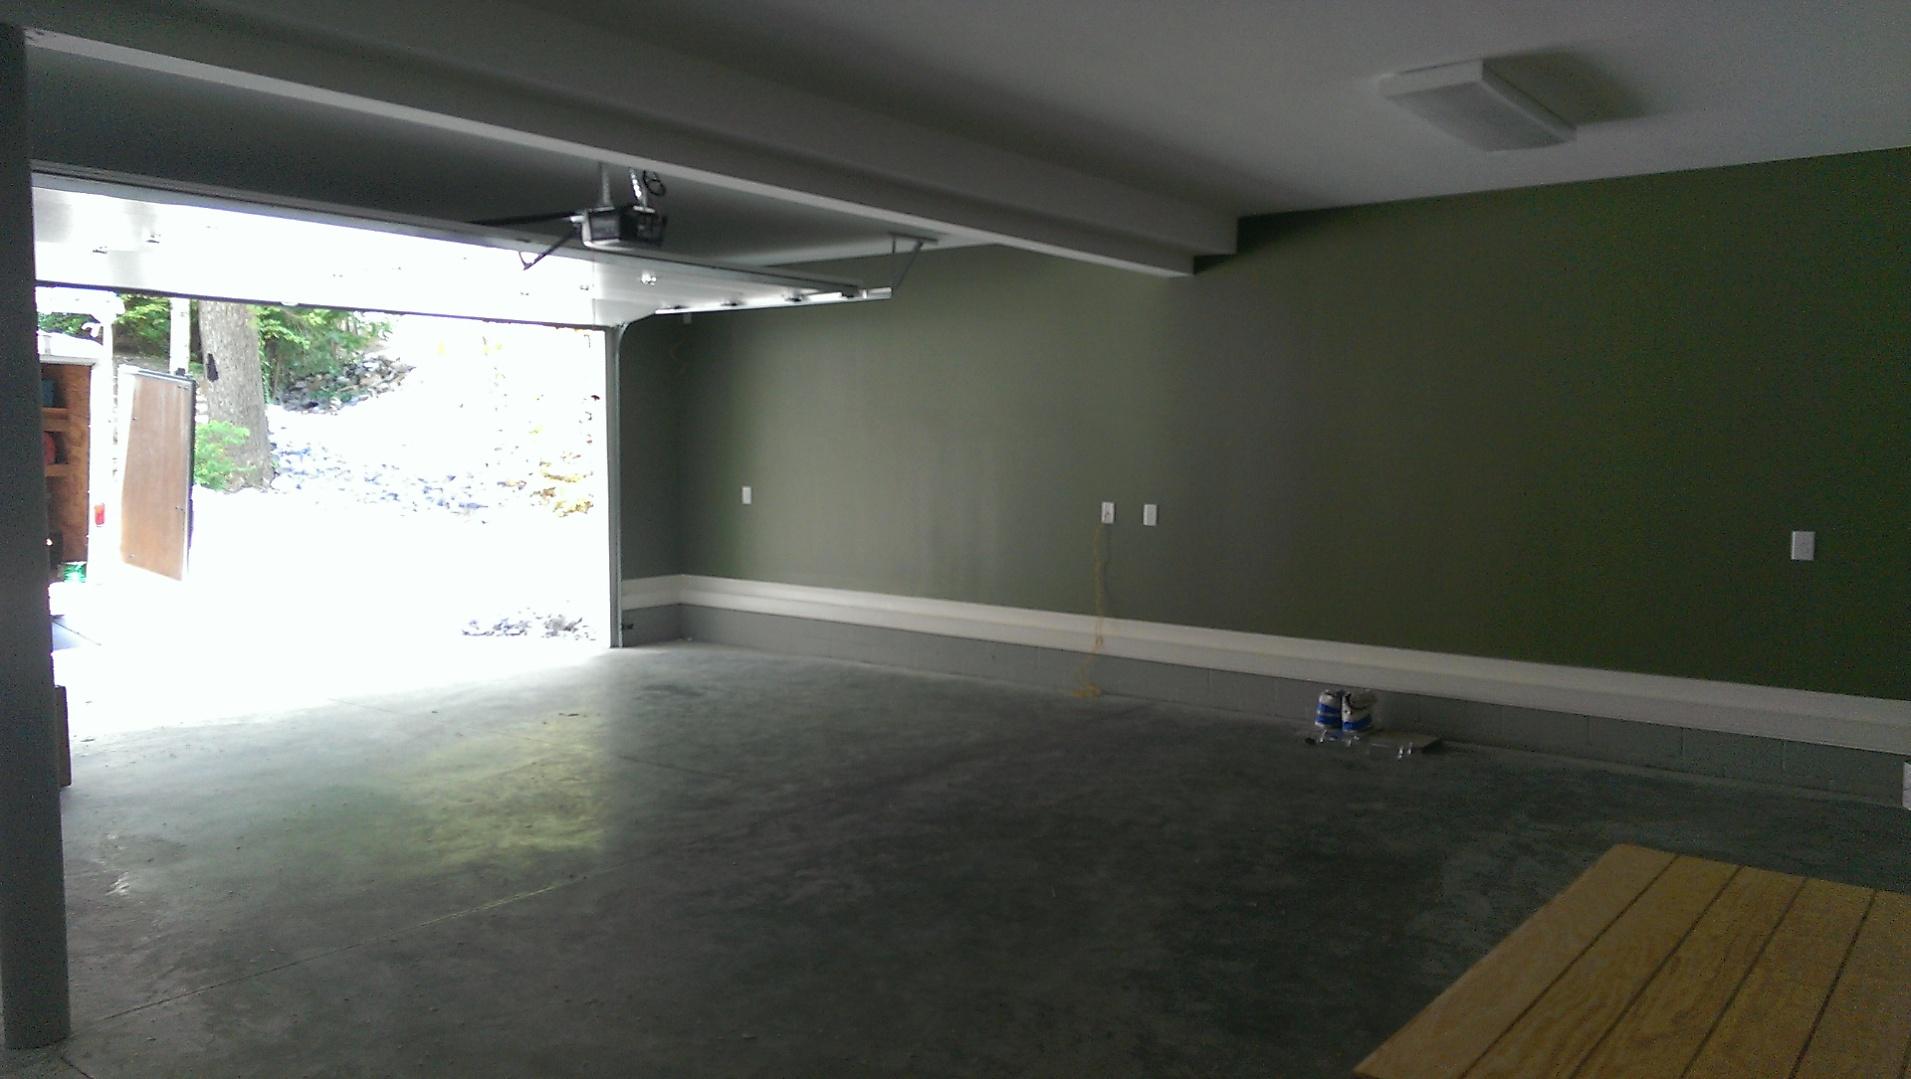 attic room furniture ideas - Joe M Staub Building Group New Garage and Bonus Room